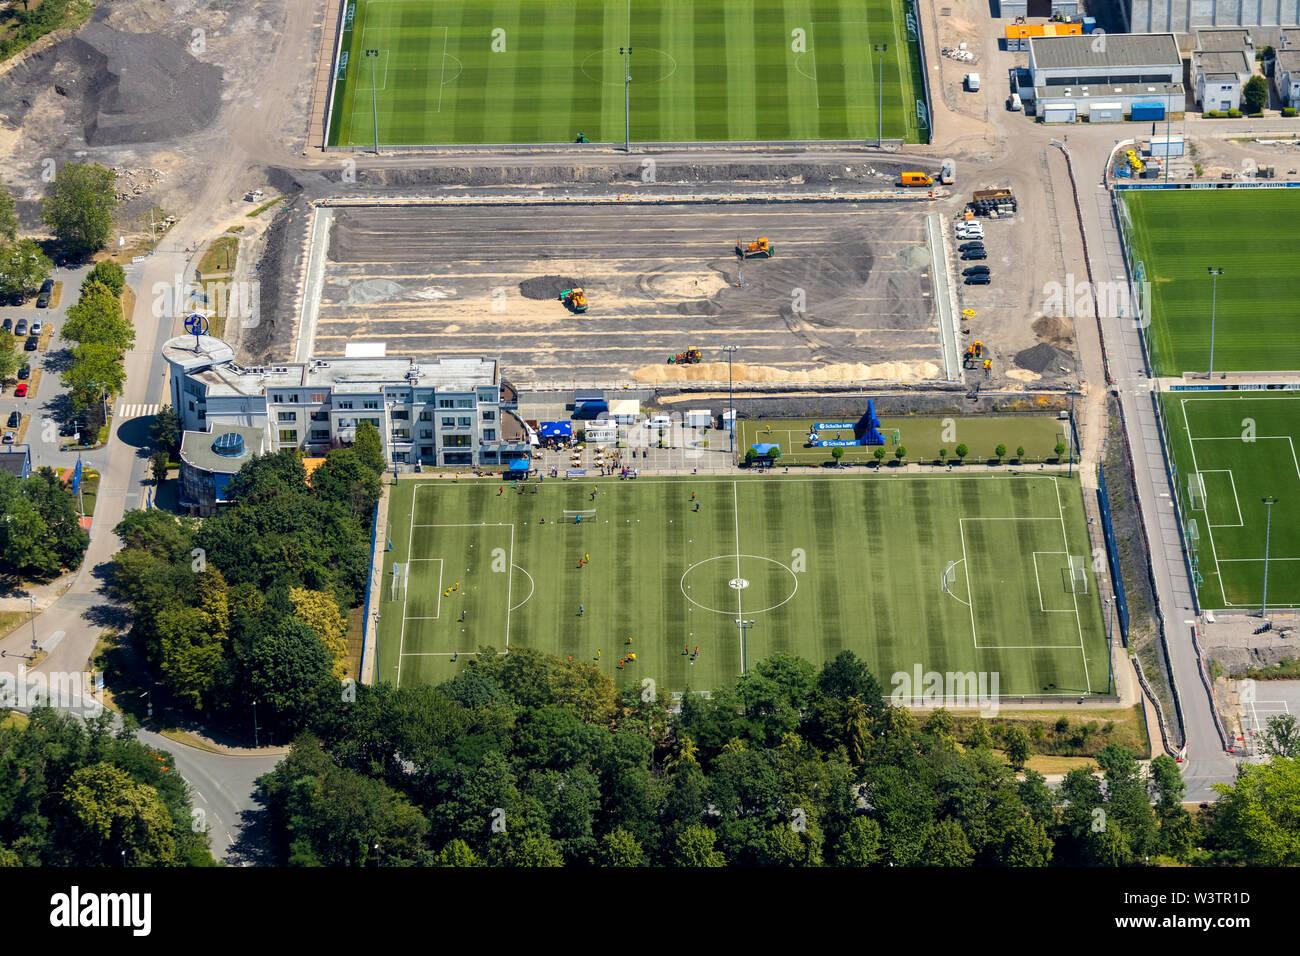 Aerial View Of The Arenapark Schalke Veltinsarena And